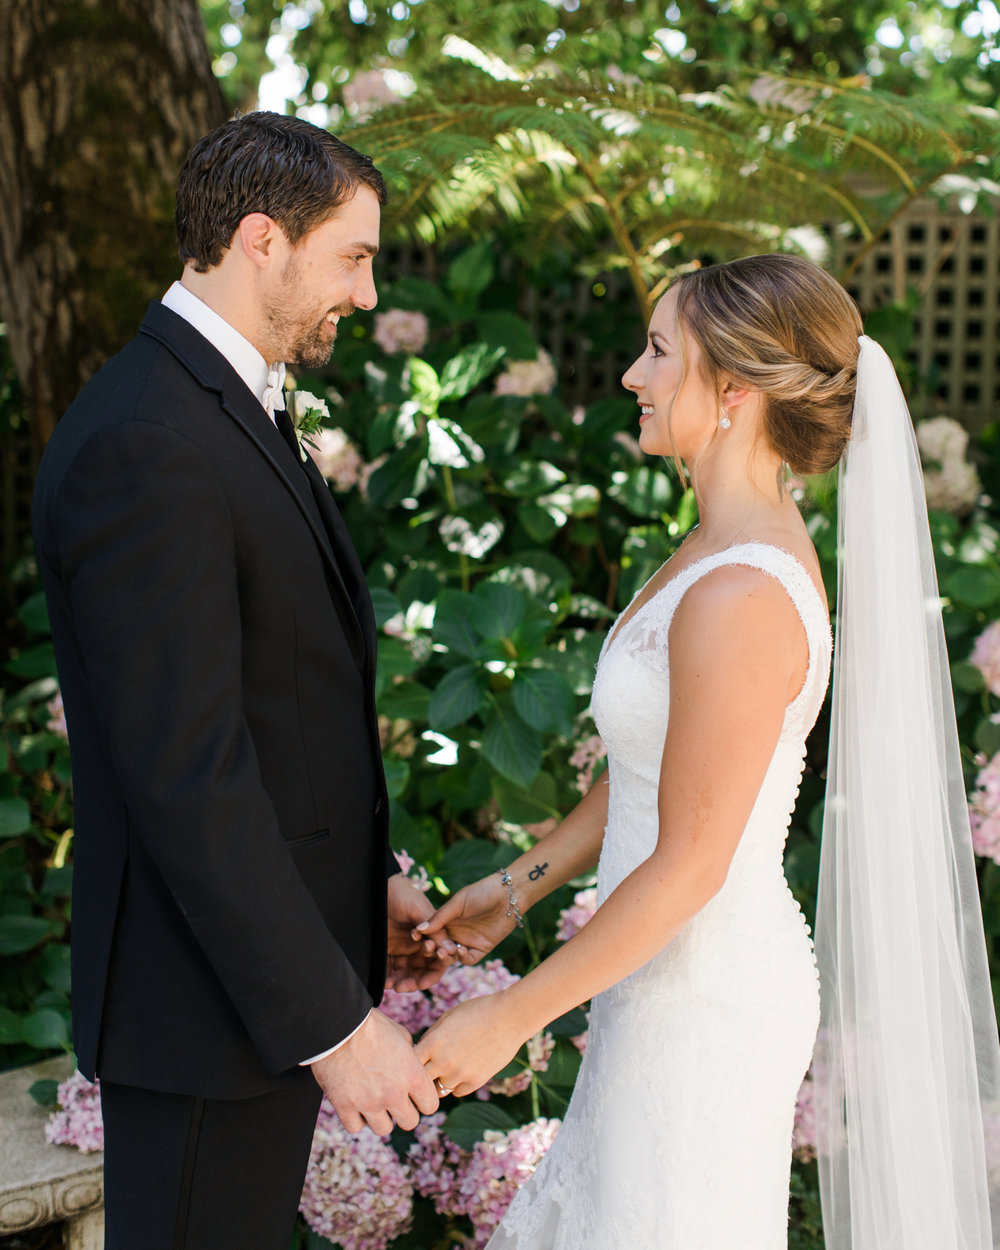 010_Vine_Hill_House_Wedding_Photographer.JPG